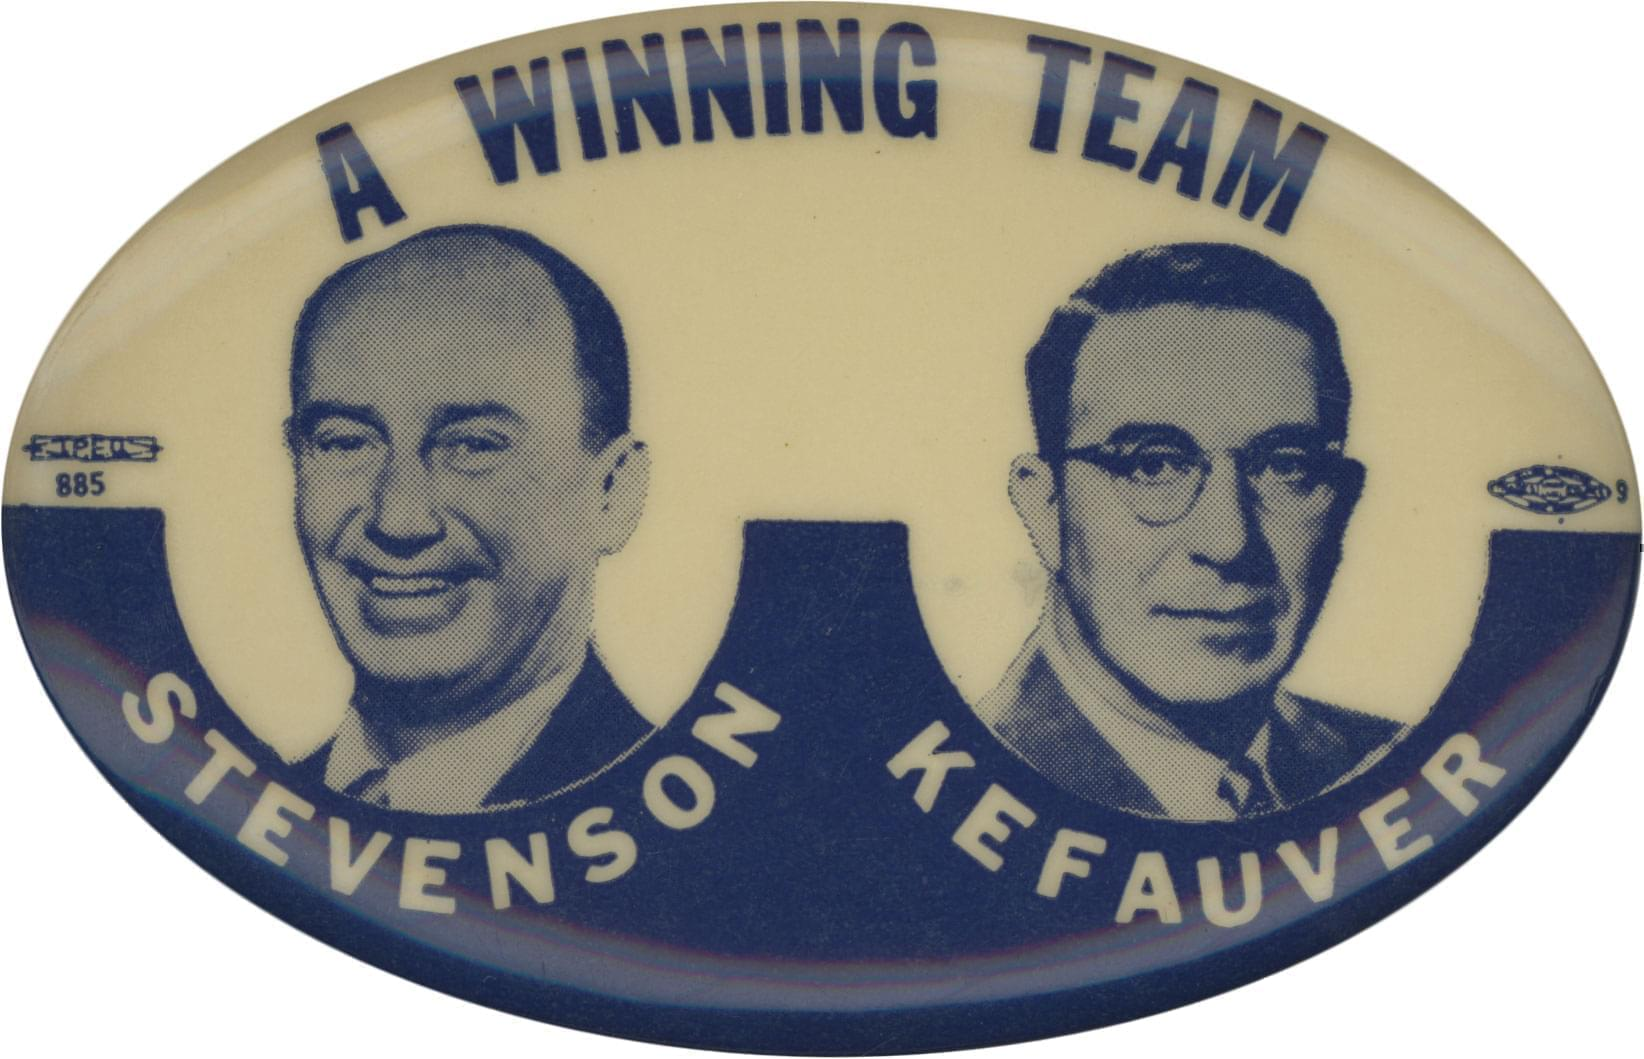 Campaign button featuring Adlai Stevenson and Estes Kefauver